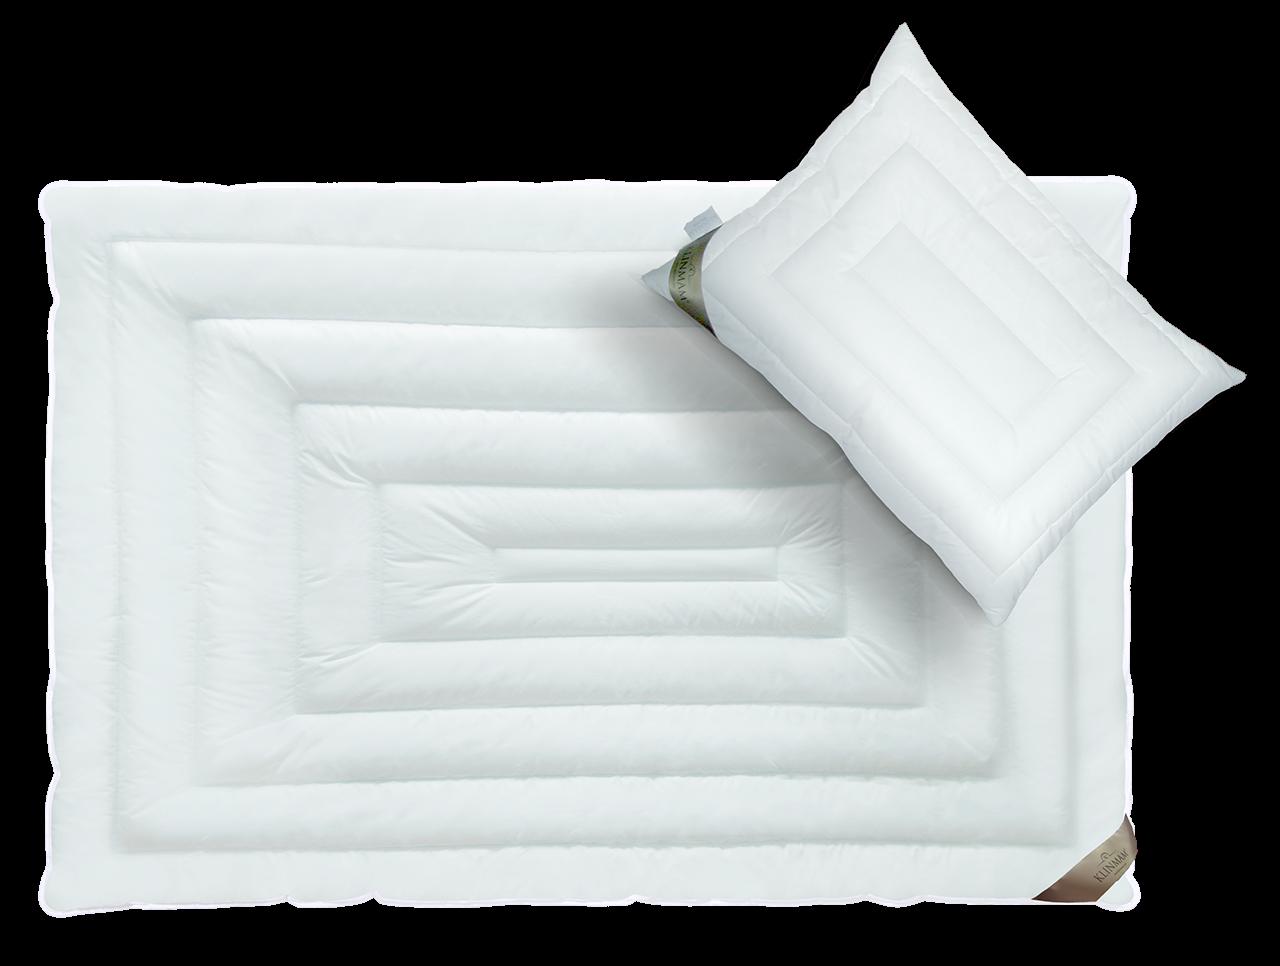 Fresh přikrývka - 135 x 200 cm - Klinmam